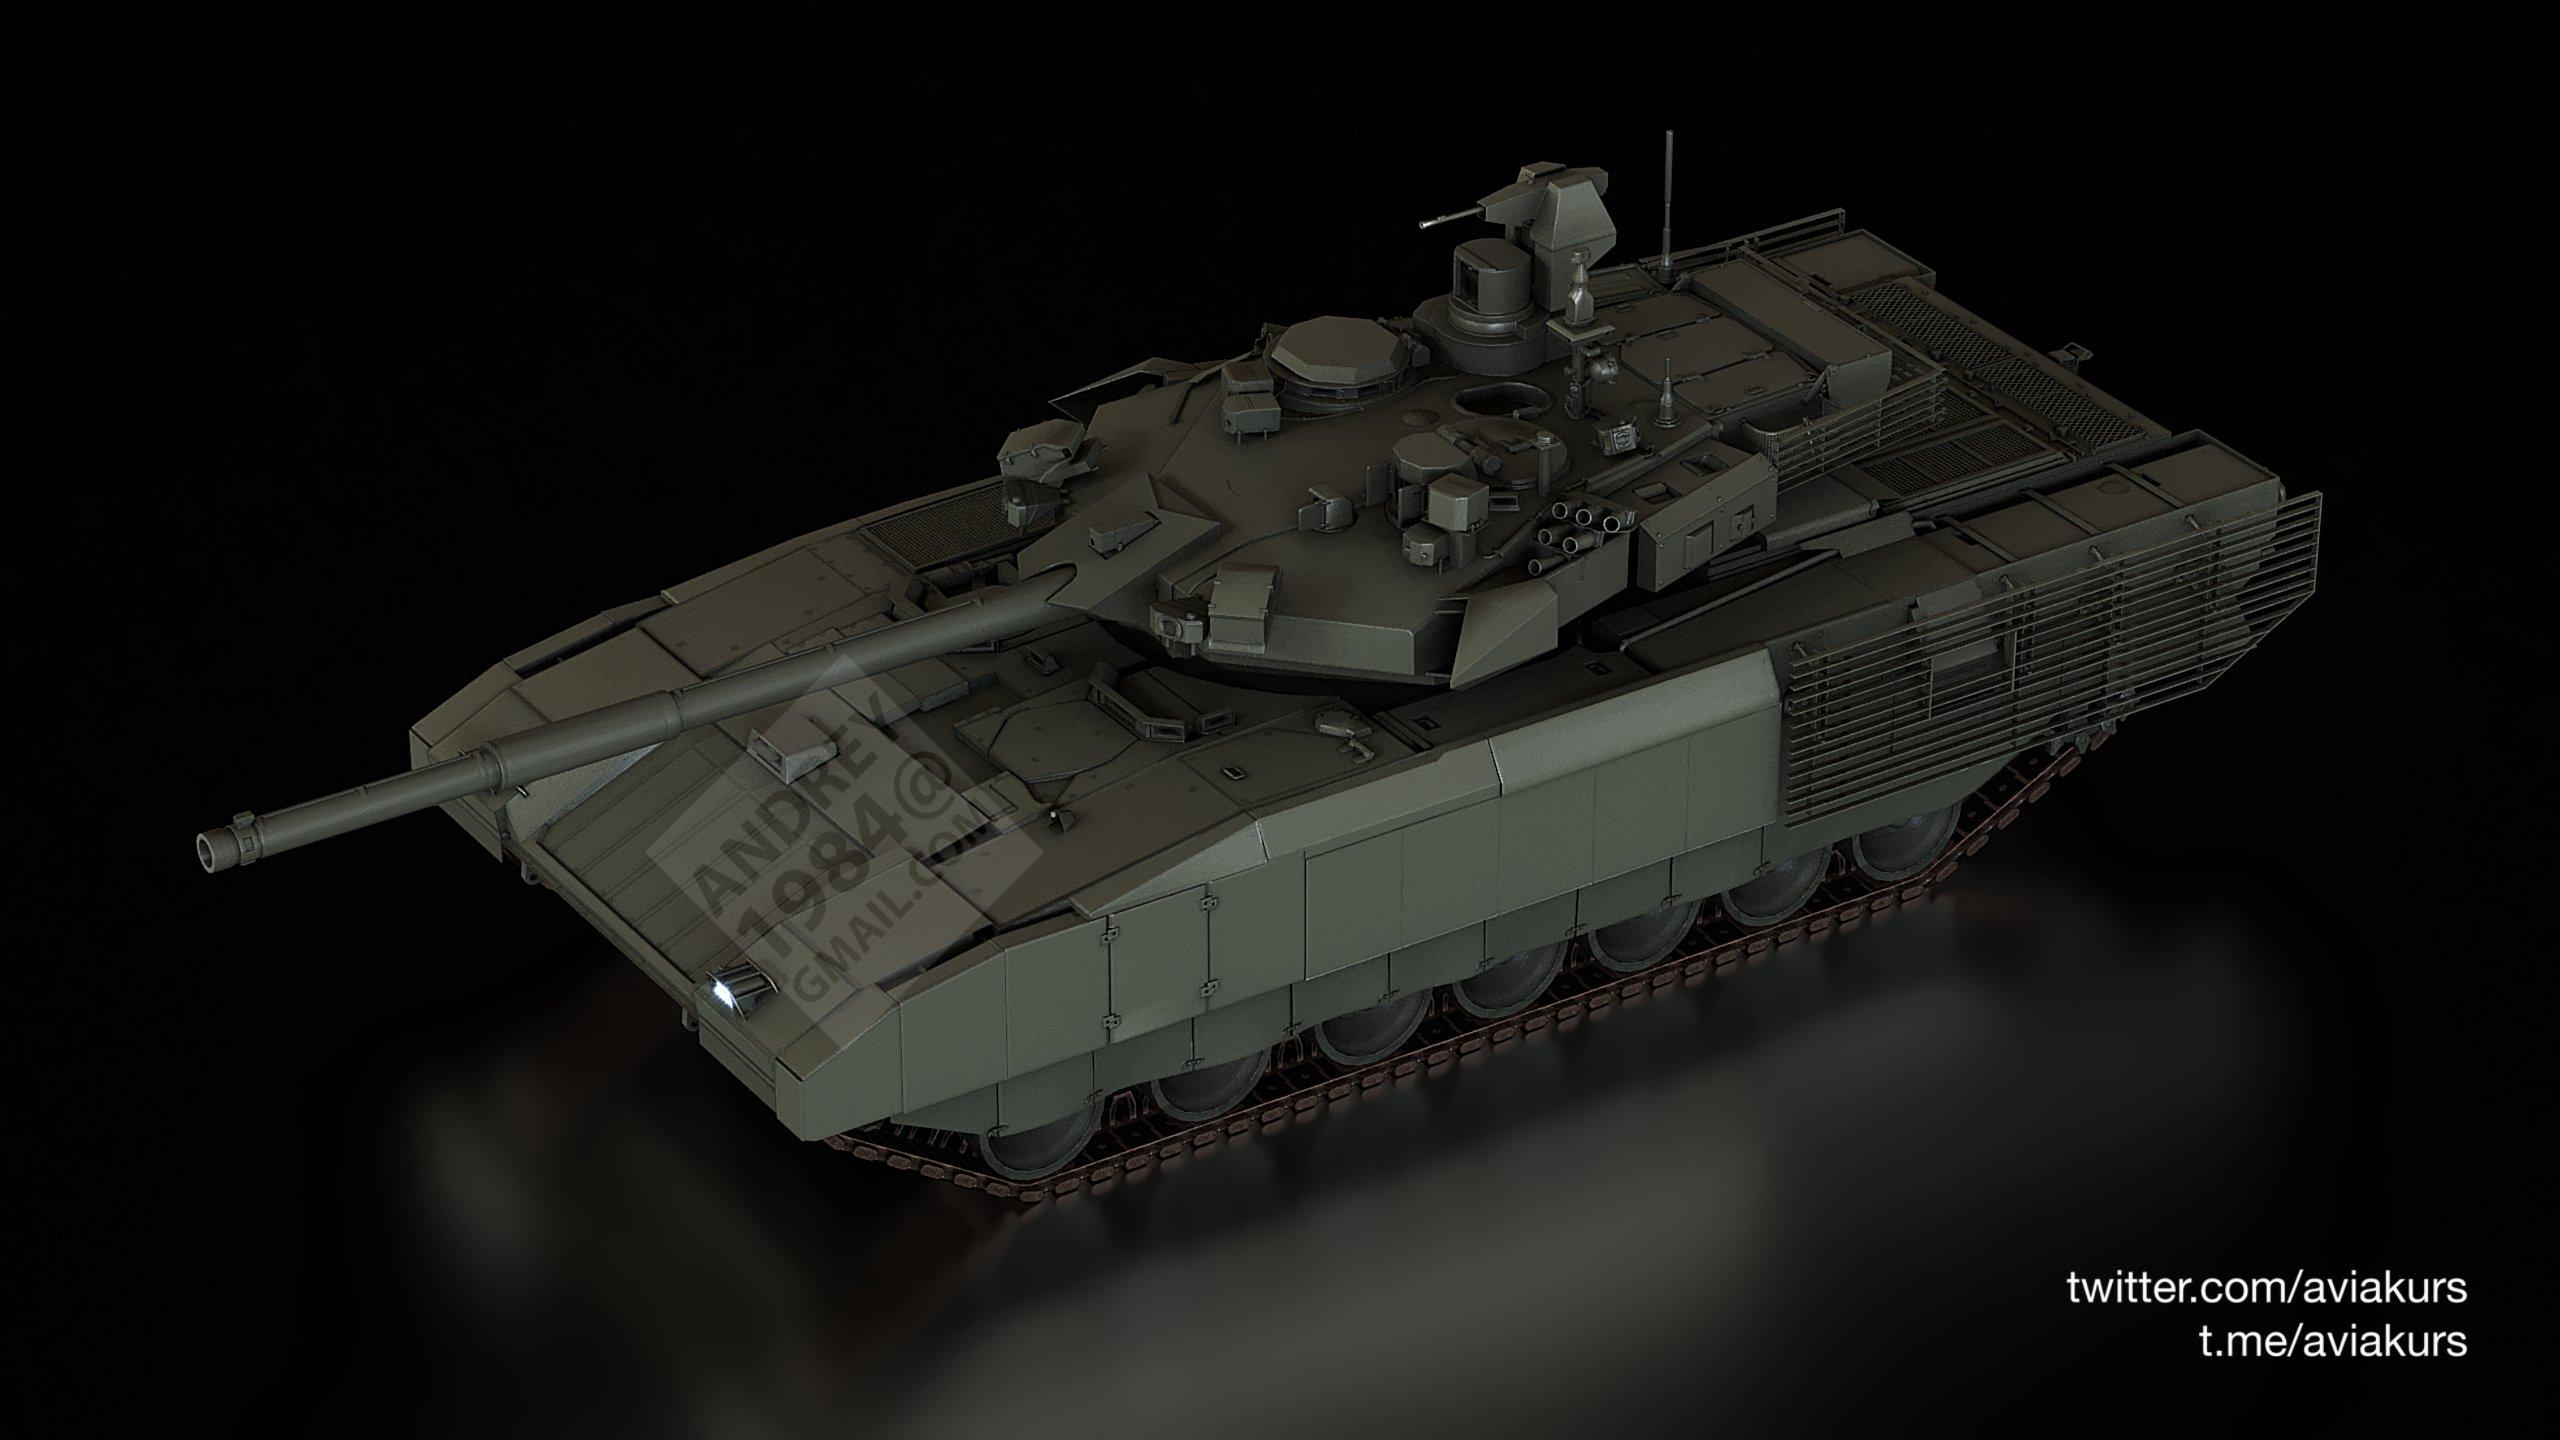 [Official] Armata Discussion thread #5 - Page 18 EpXO9G3XIBMFnAg?format=jpg&name=4096x4096